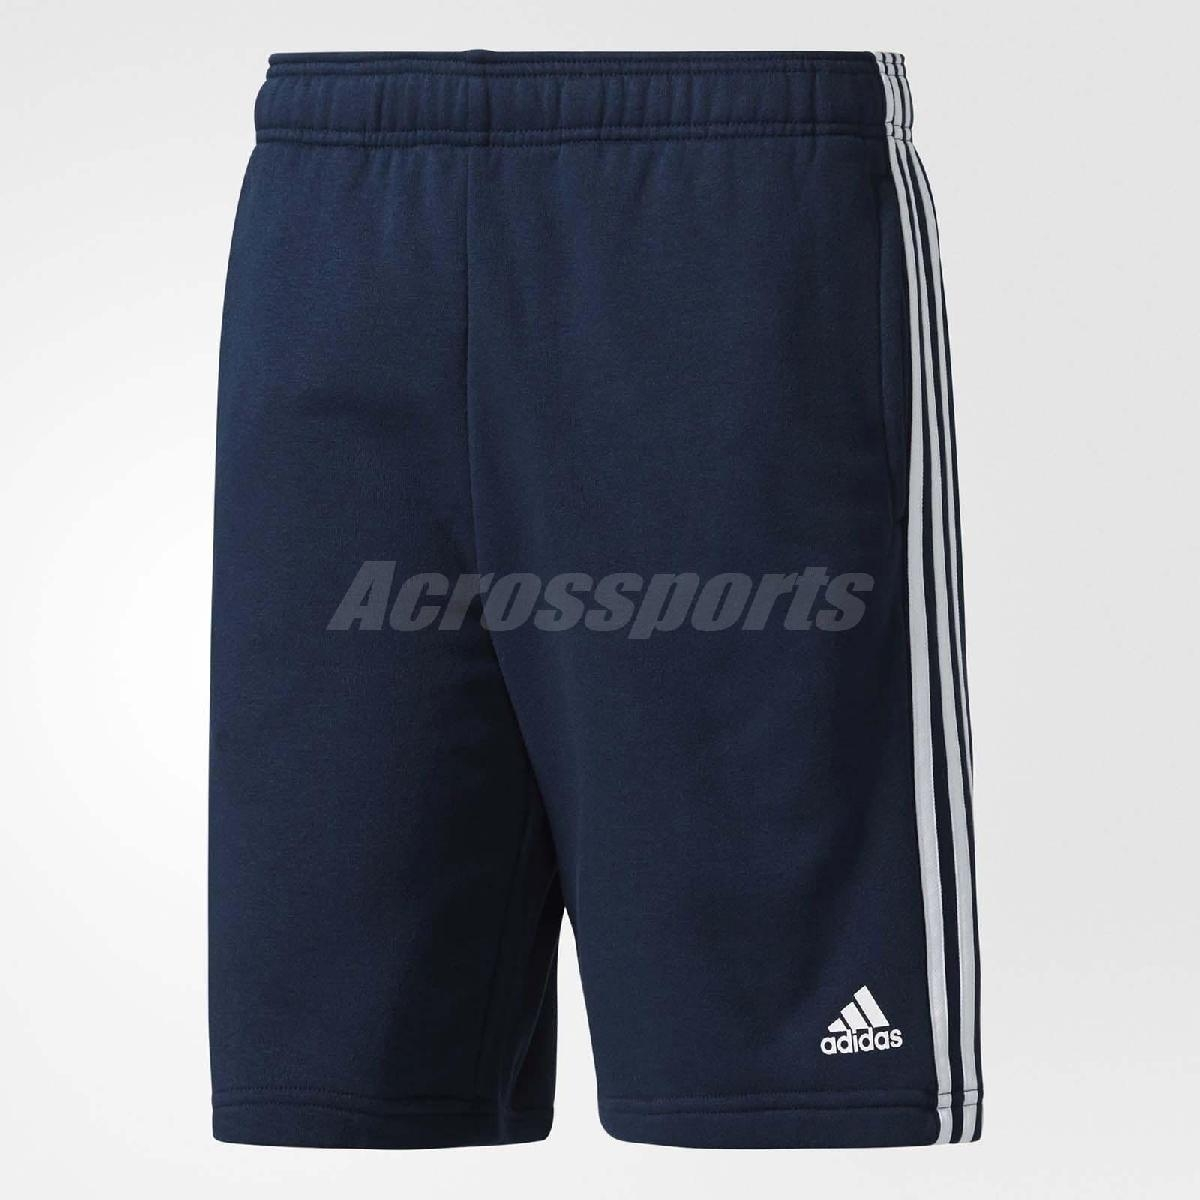 adidas 短褲 ESS 3S SHORT FT 男款 三條線 運動 休閒 經典 穿搭 基本款 素面 藍 白 【PUMP306】 BP5467